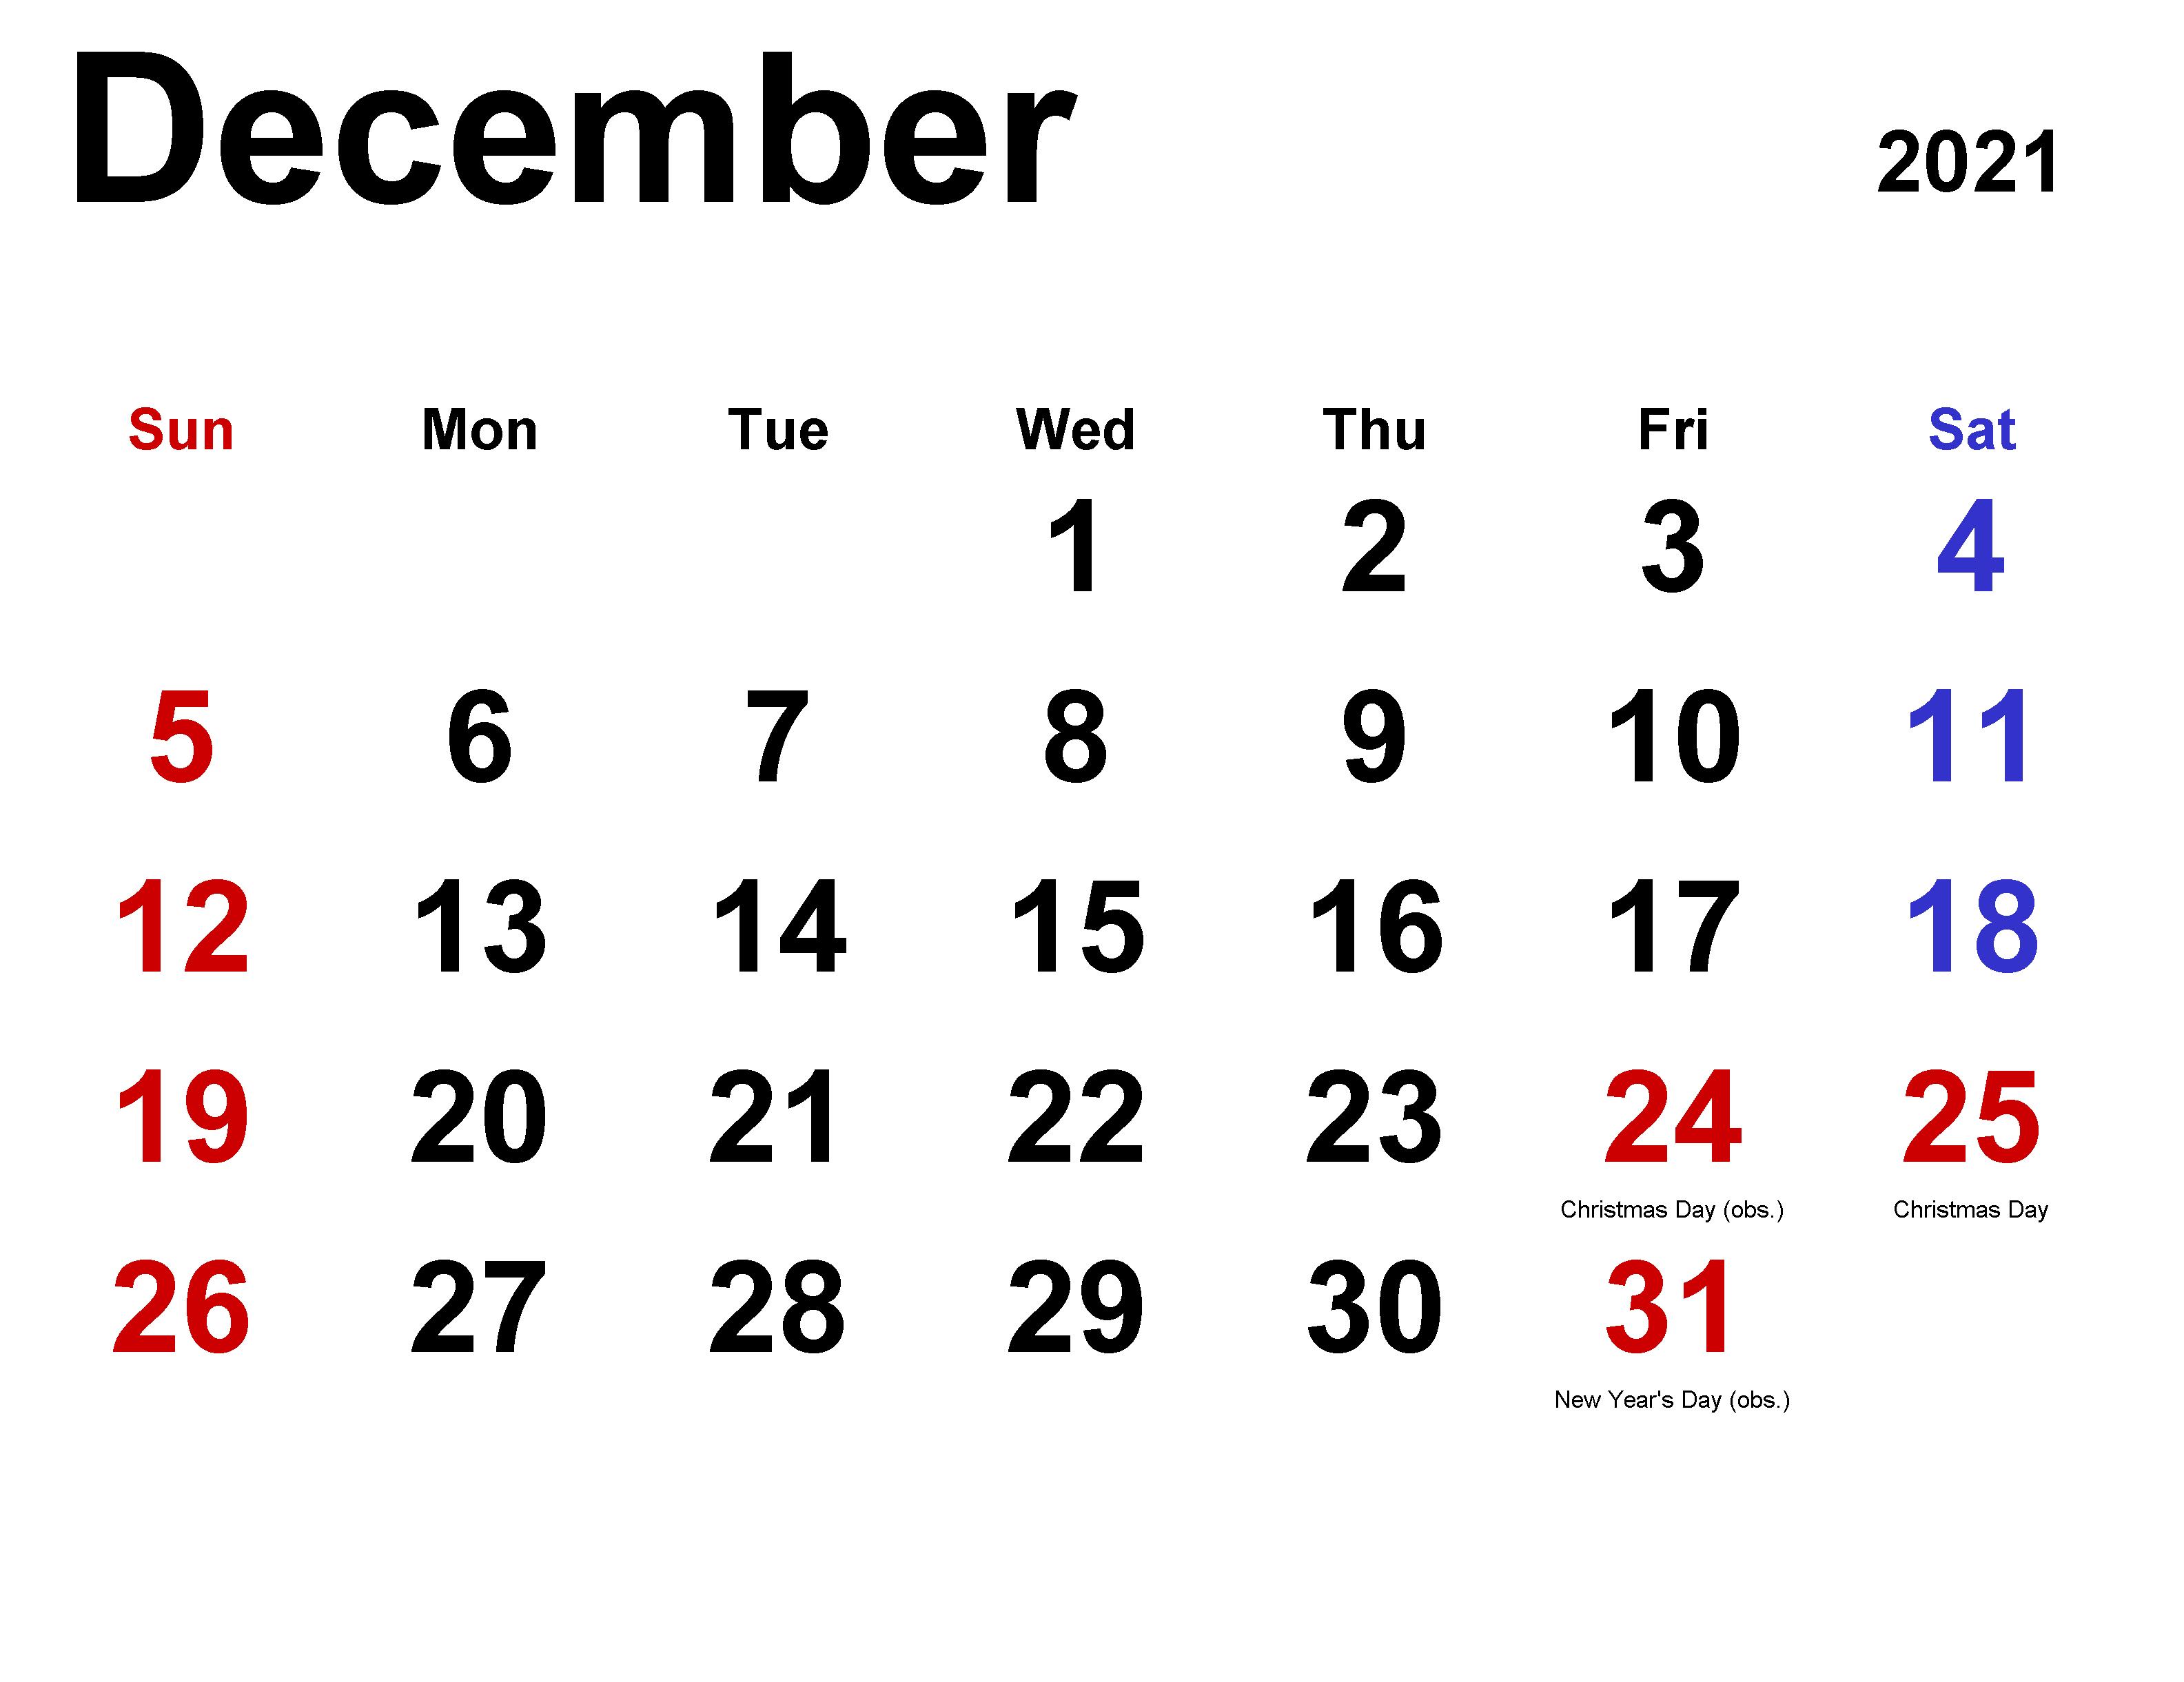 December 2021 Calendar Template for Excel